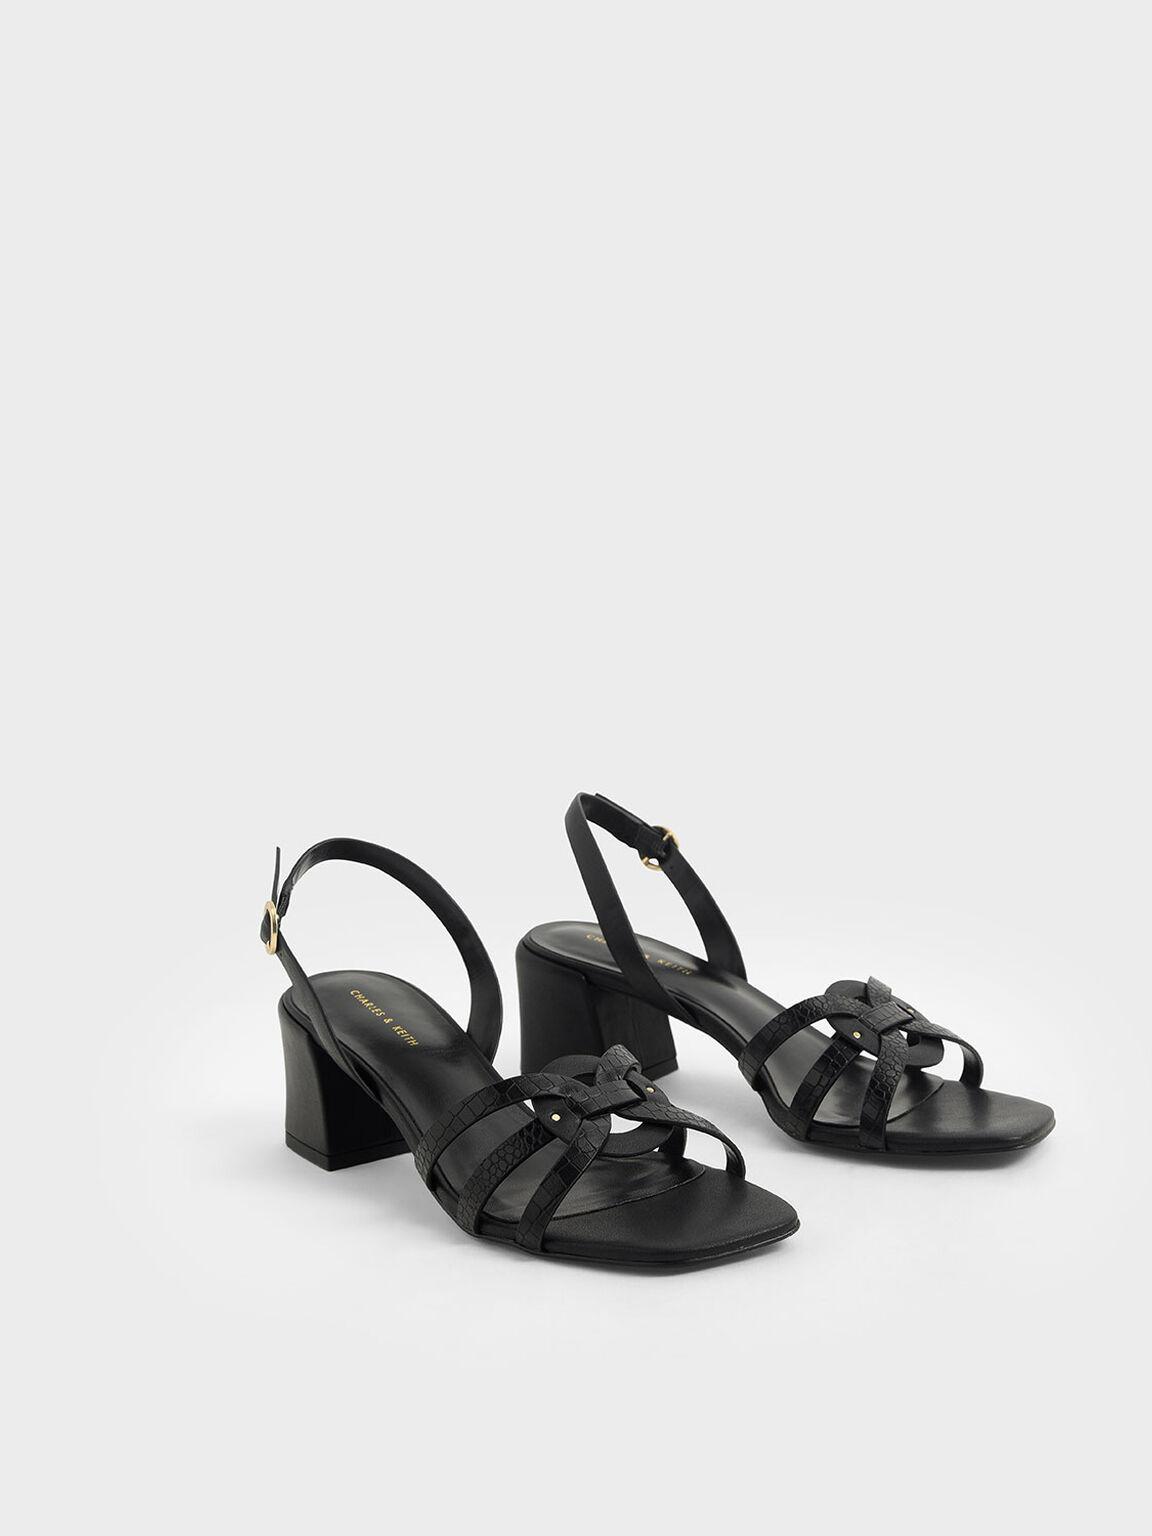 Snake Print Block Heel Sandals, Animal Print Black, hi-res